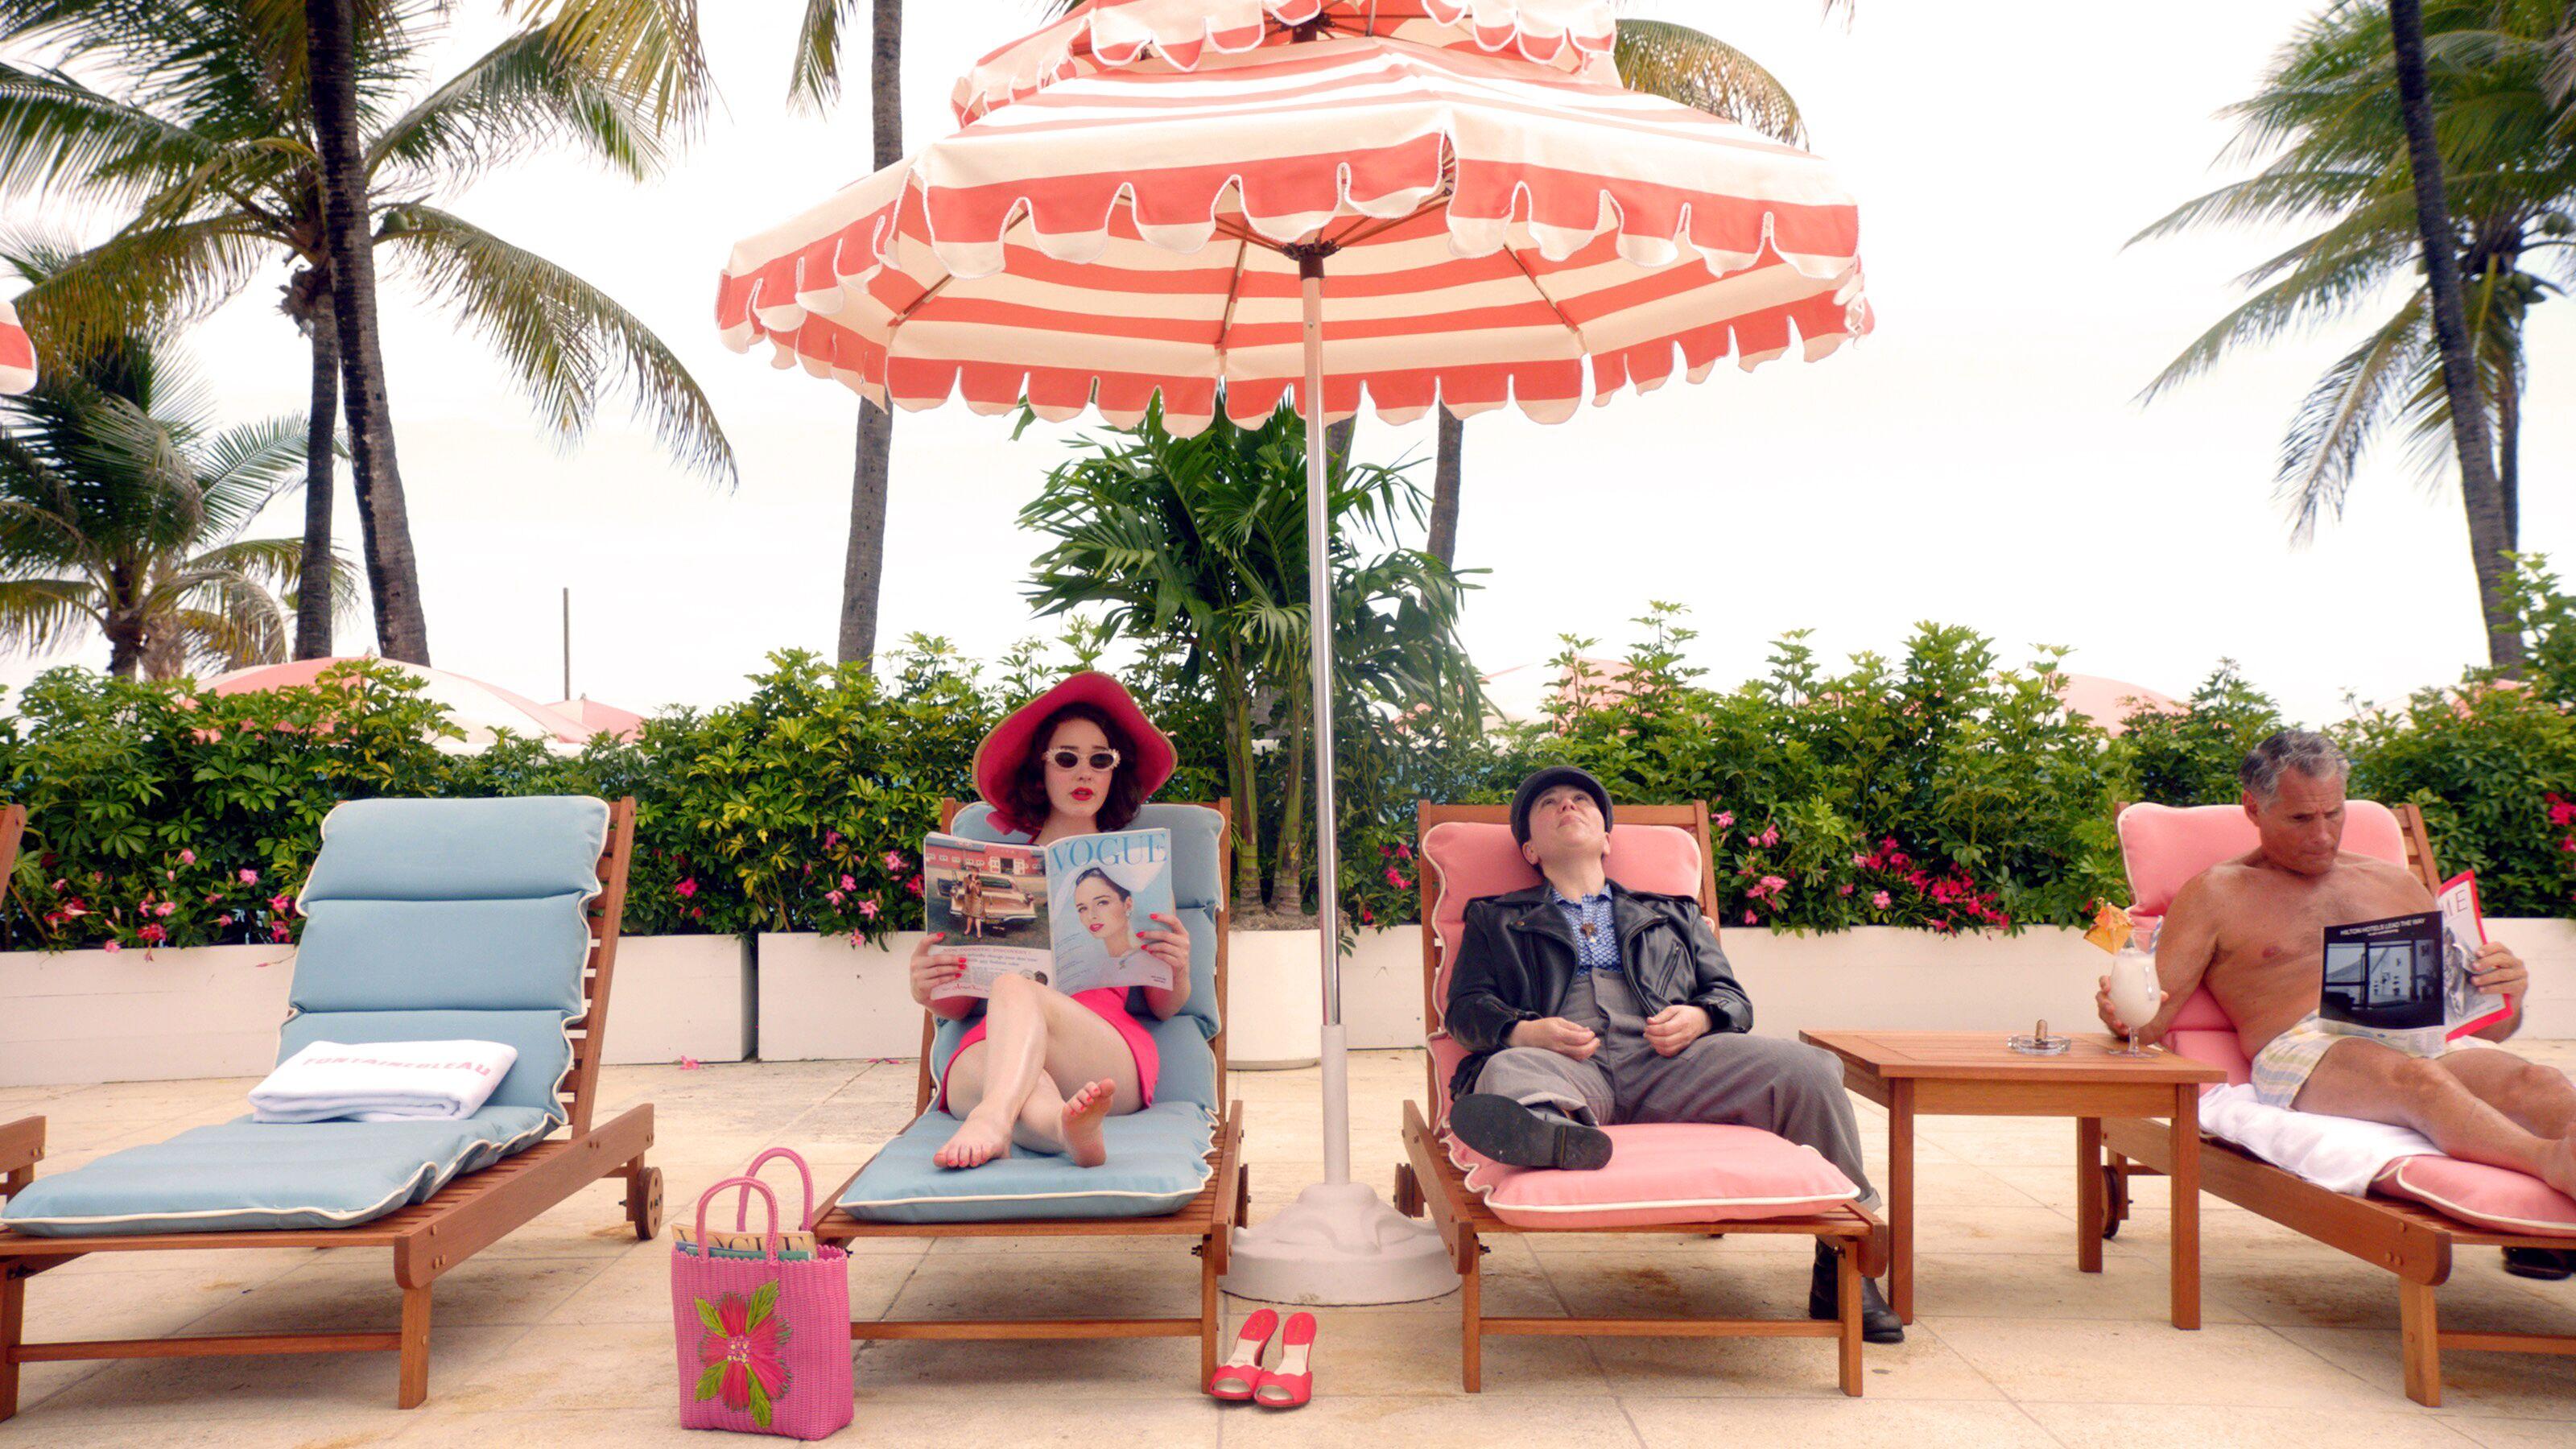 5 major takeaways from The Marvelous Mrs. Maisel Season 3 trailer